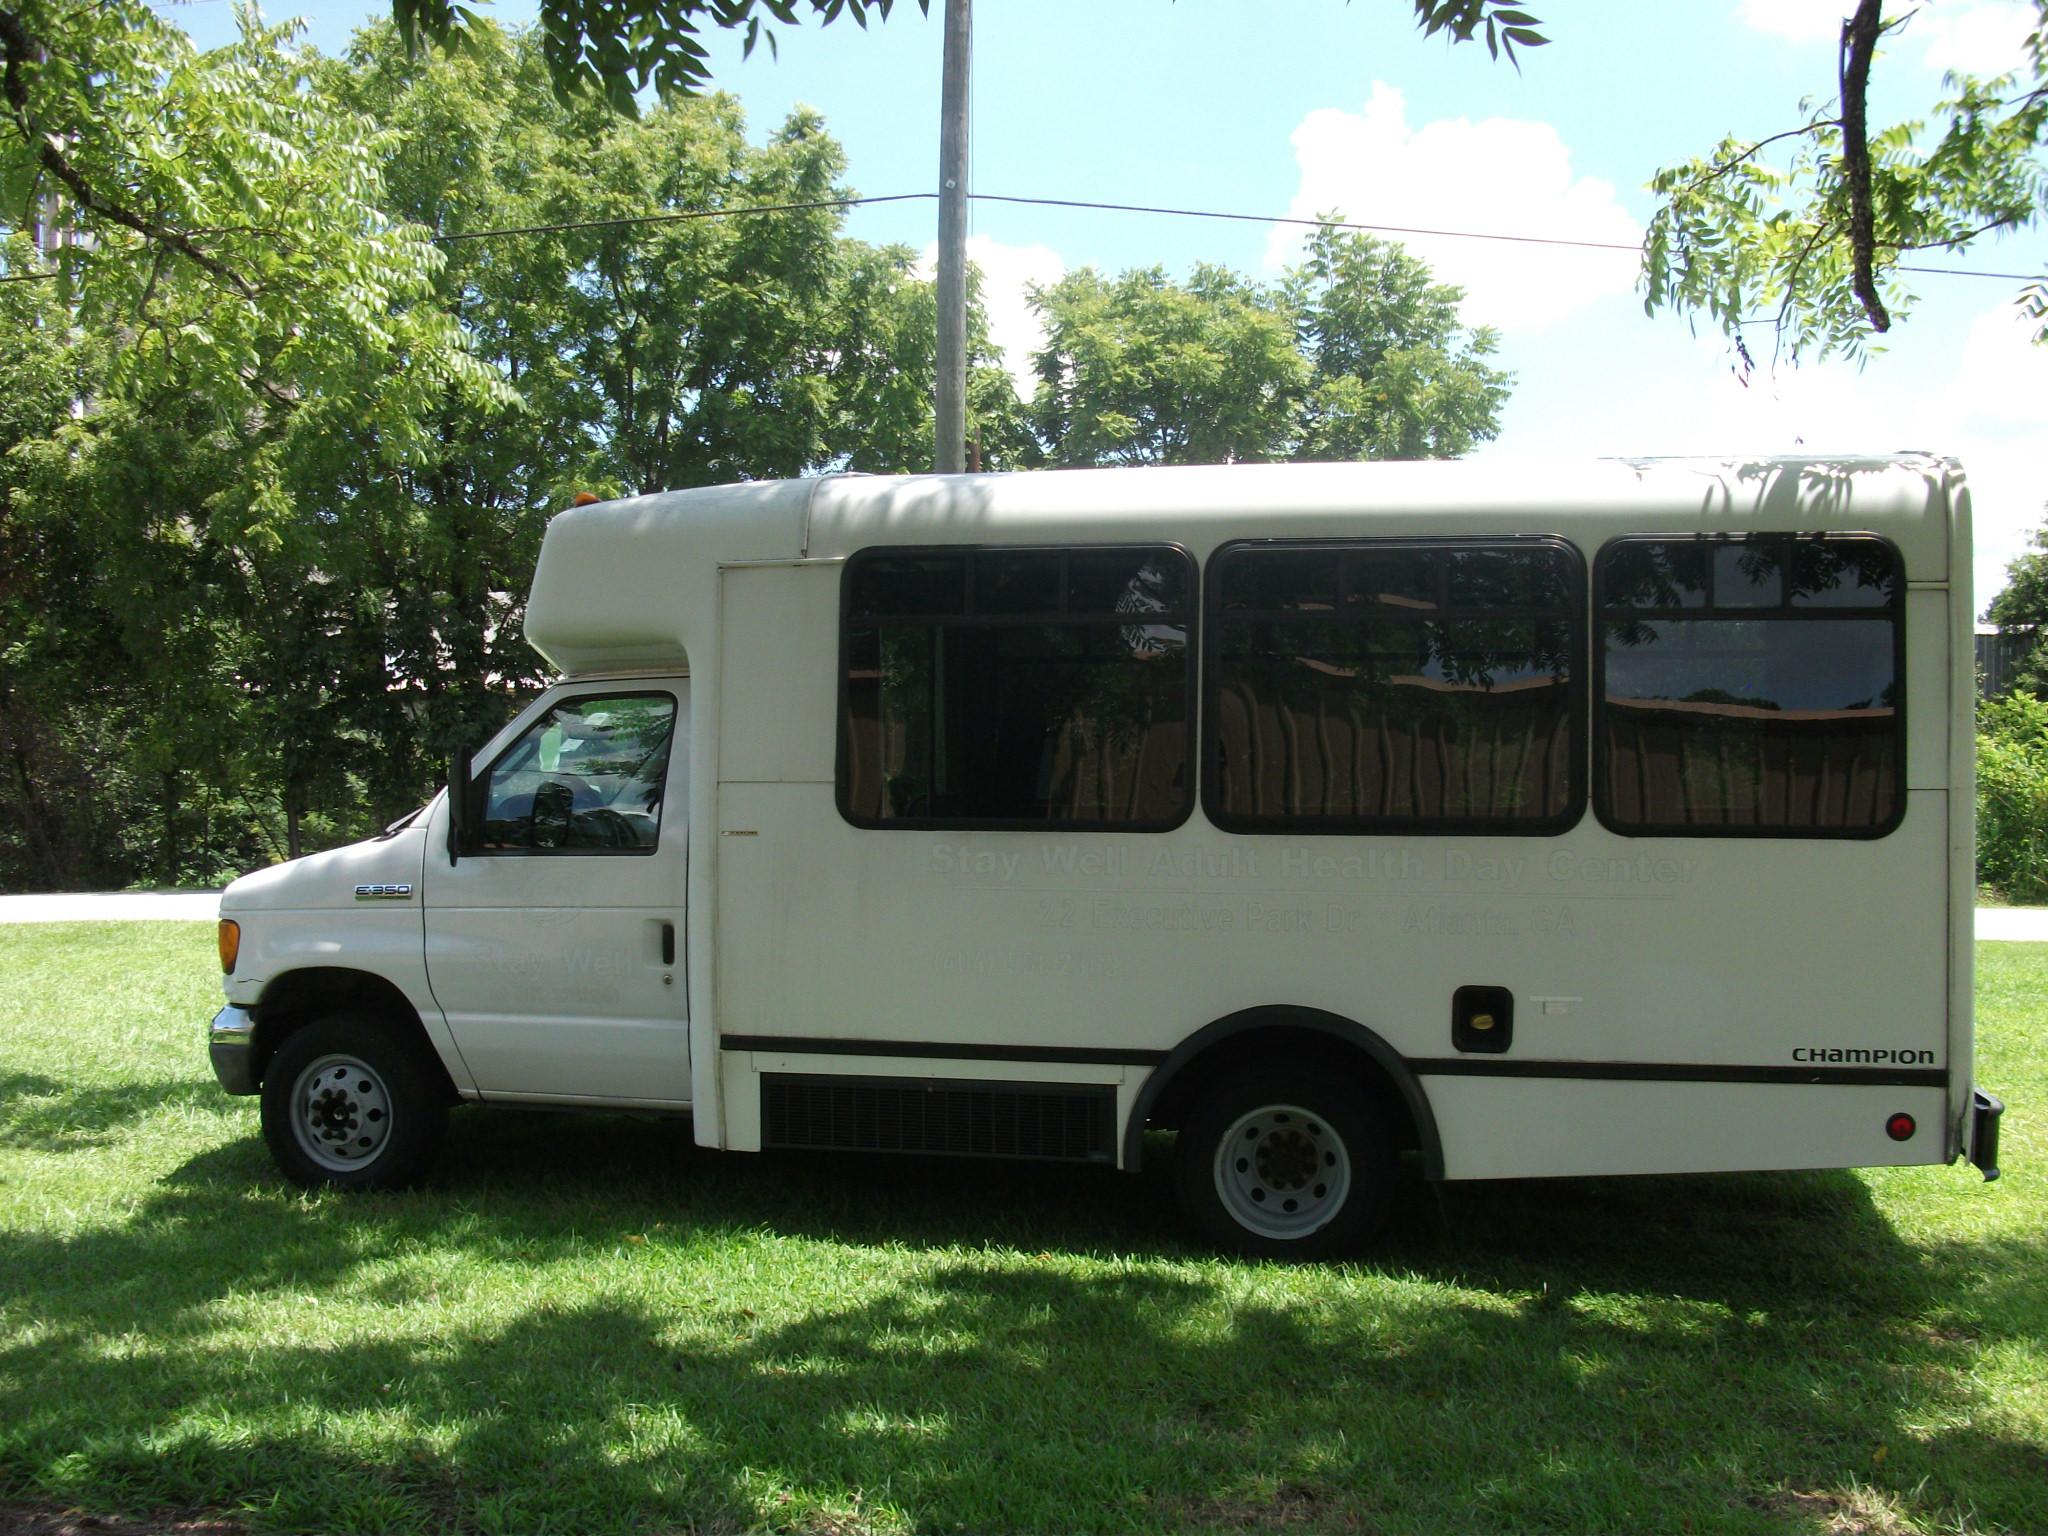 2006 Ford E350 Champion Shuttle - AH705 - Classic Bus Sales